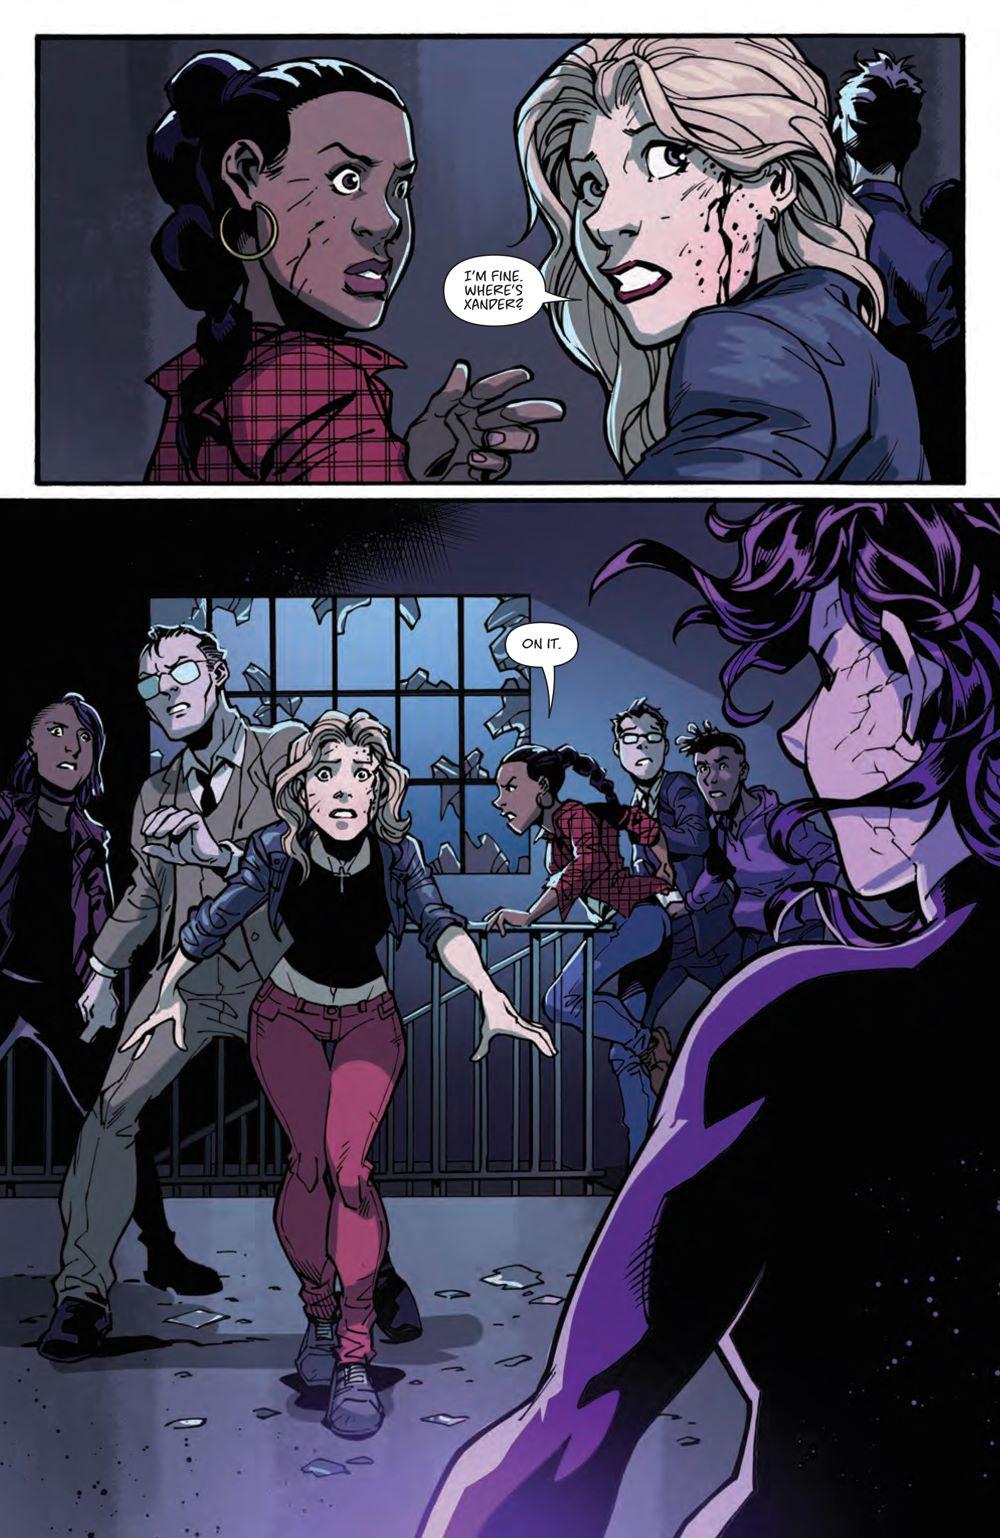 Buffy_024_PRESS_7 ComicList Previews: BUFFY THE VAMPIRE SLAYER #24